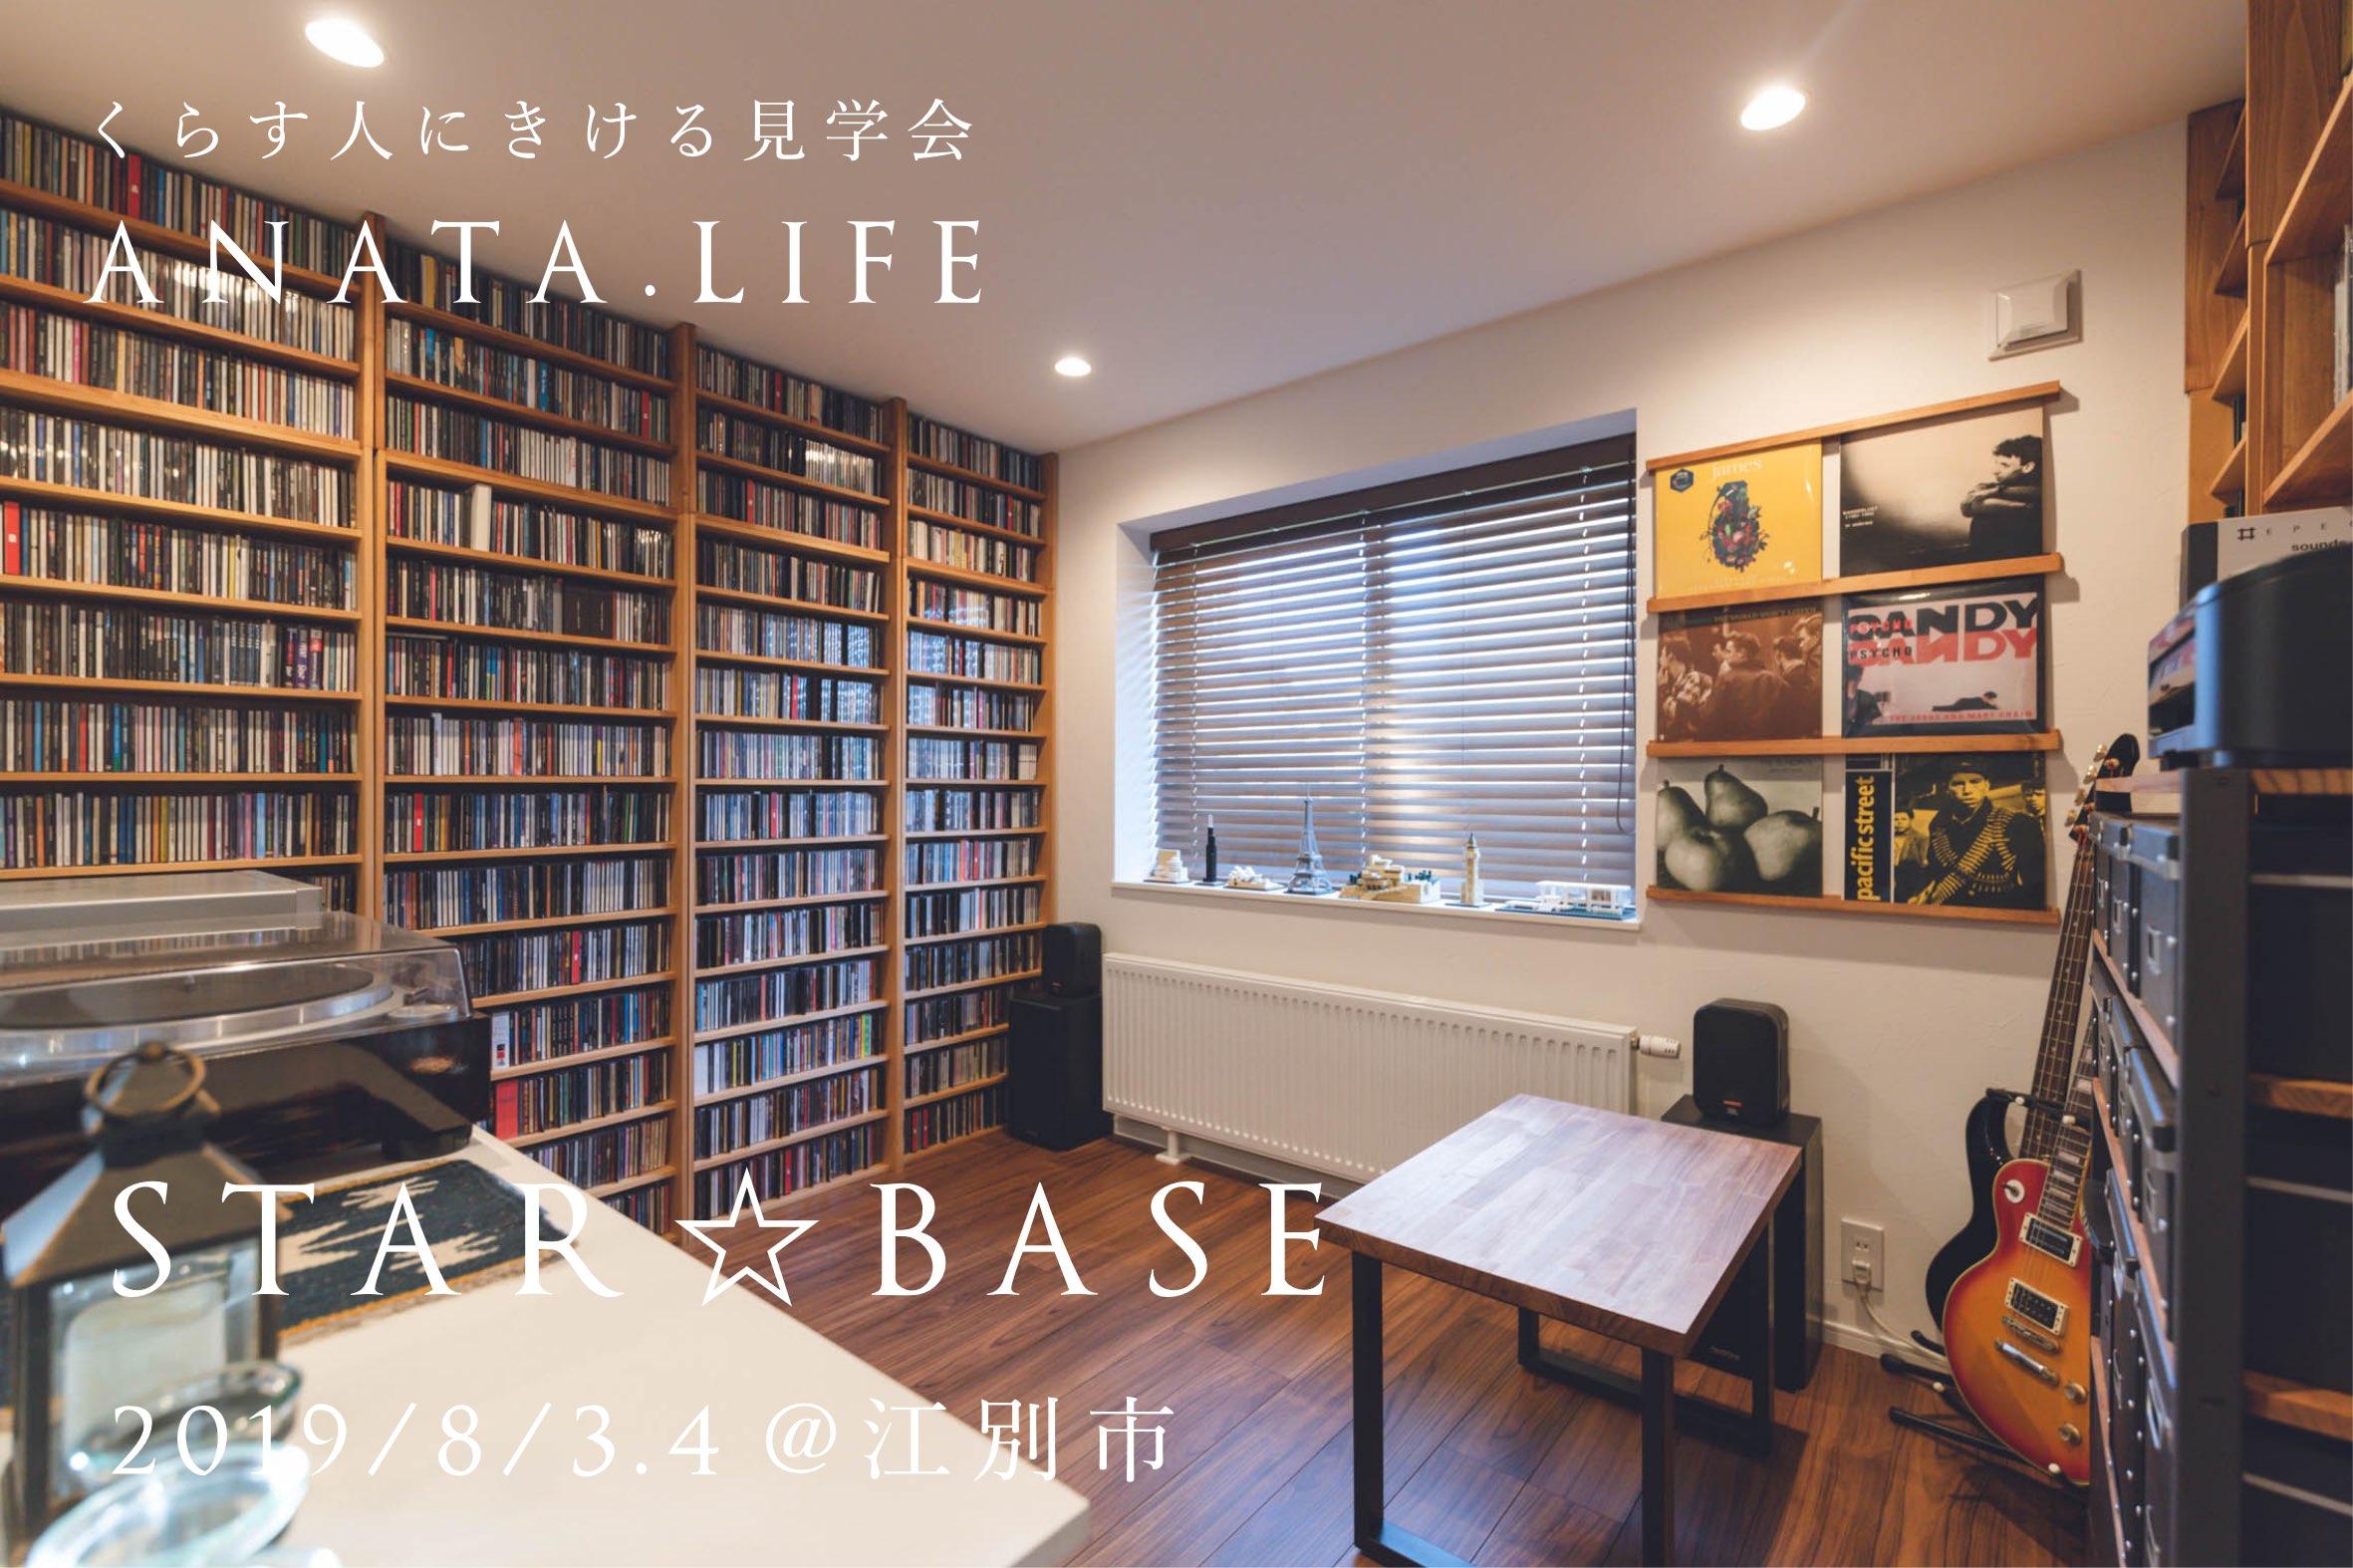 ANATA.LIFE「STAR☆BASE」-くらす人にきける見学会-